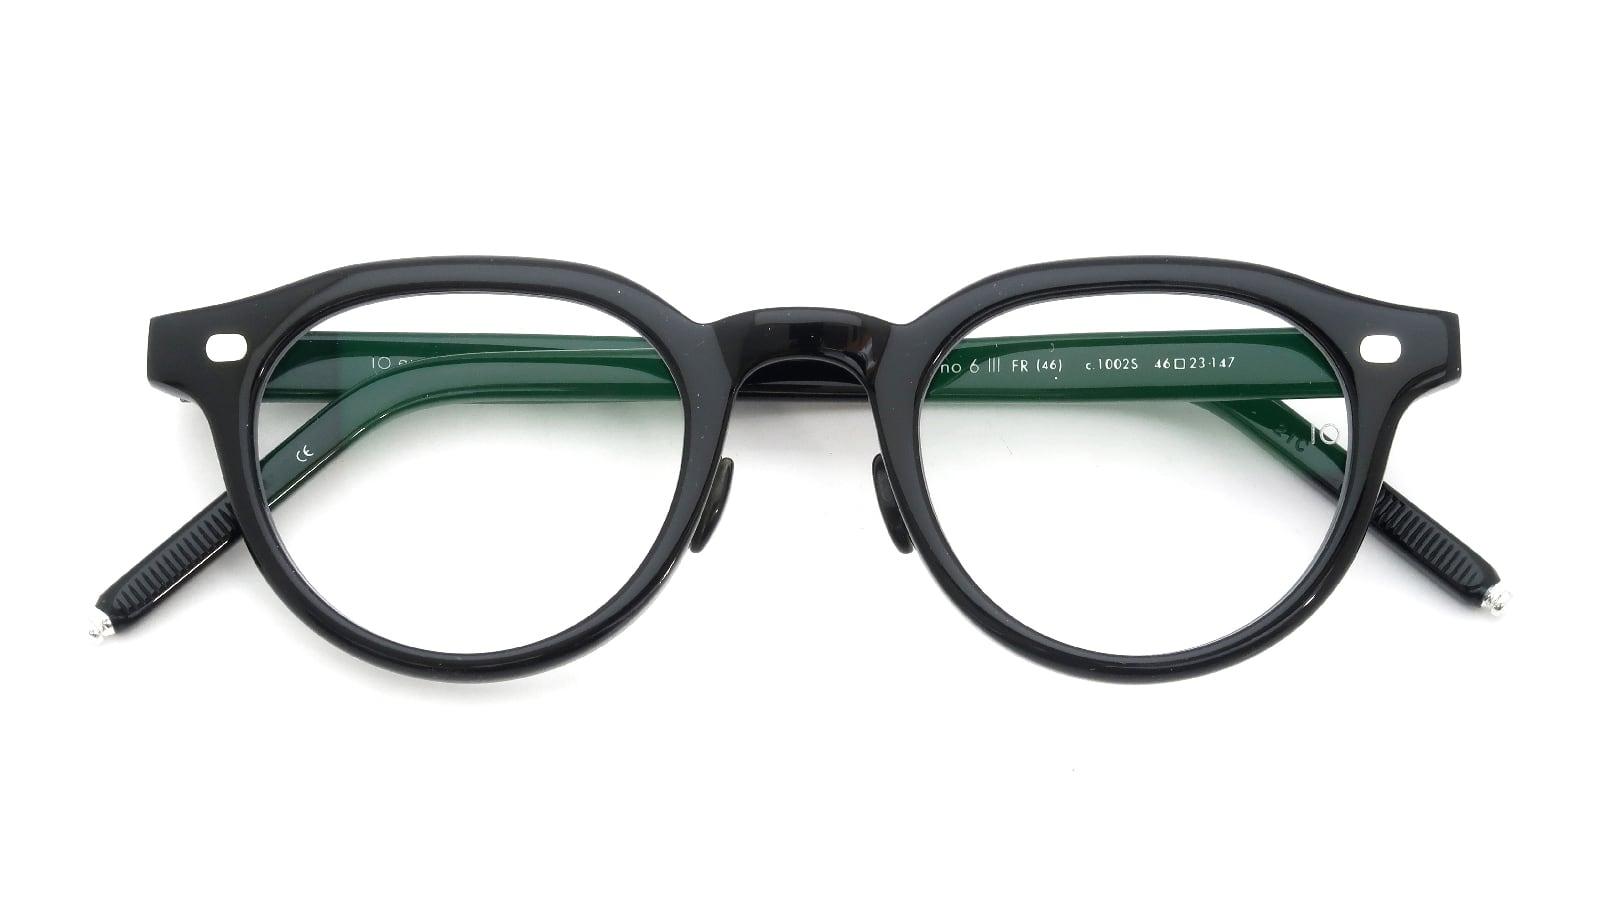 10 eyevan NO.6 Ⅲ FR 46size c.1002S Black 折り畳み詳細